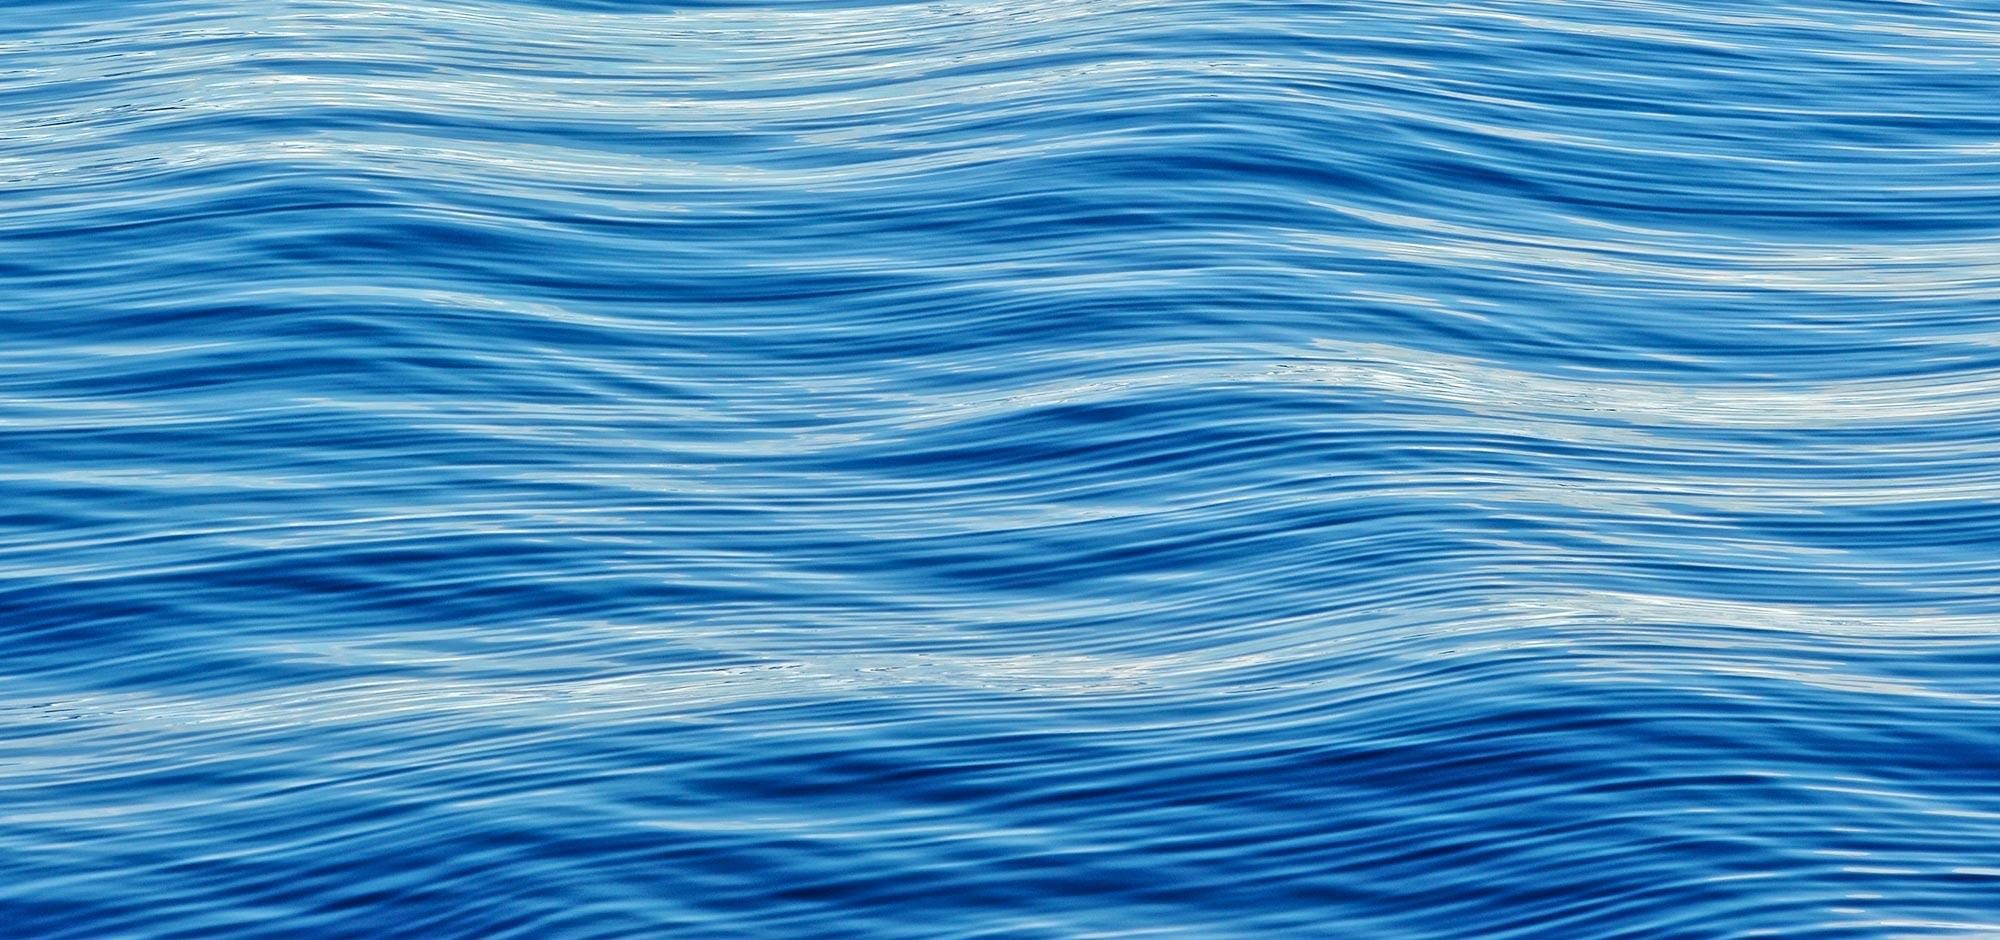 Wallpaper Full Color Hd Blue Ocean Strategy